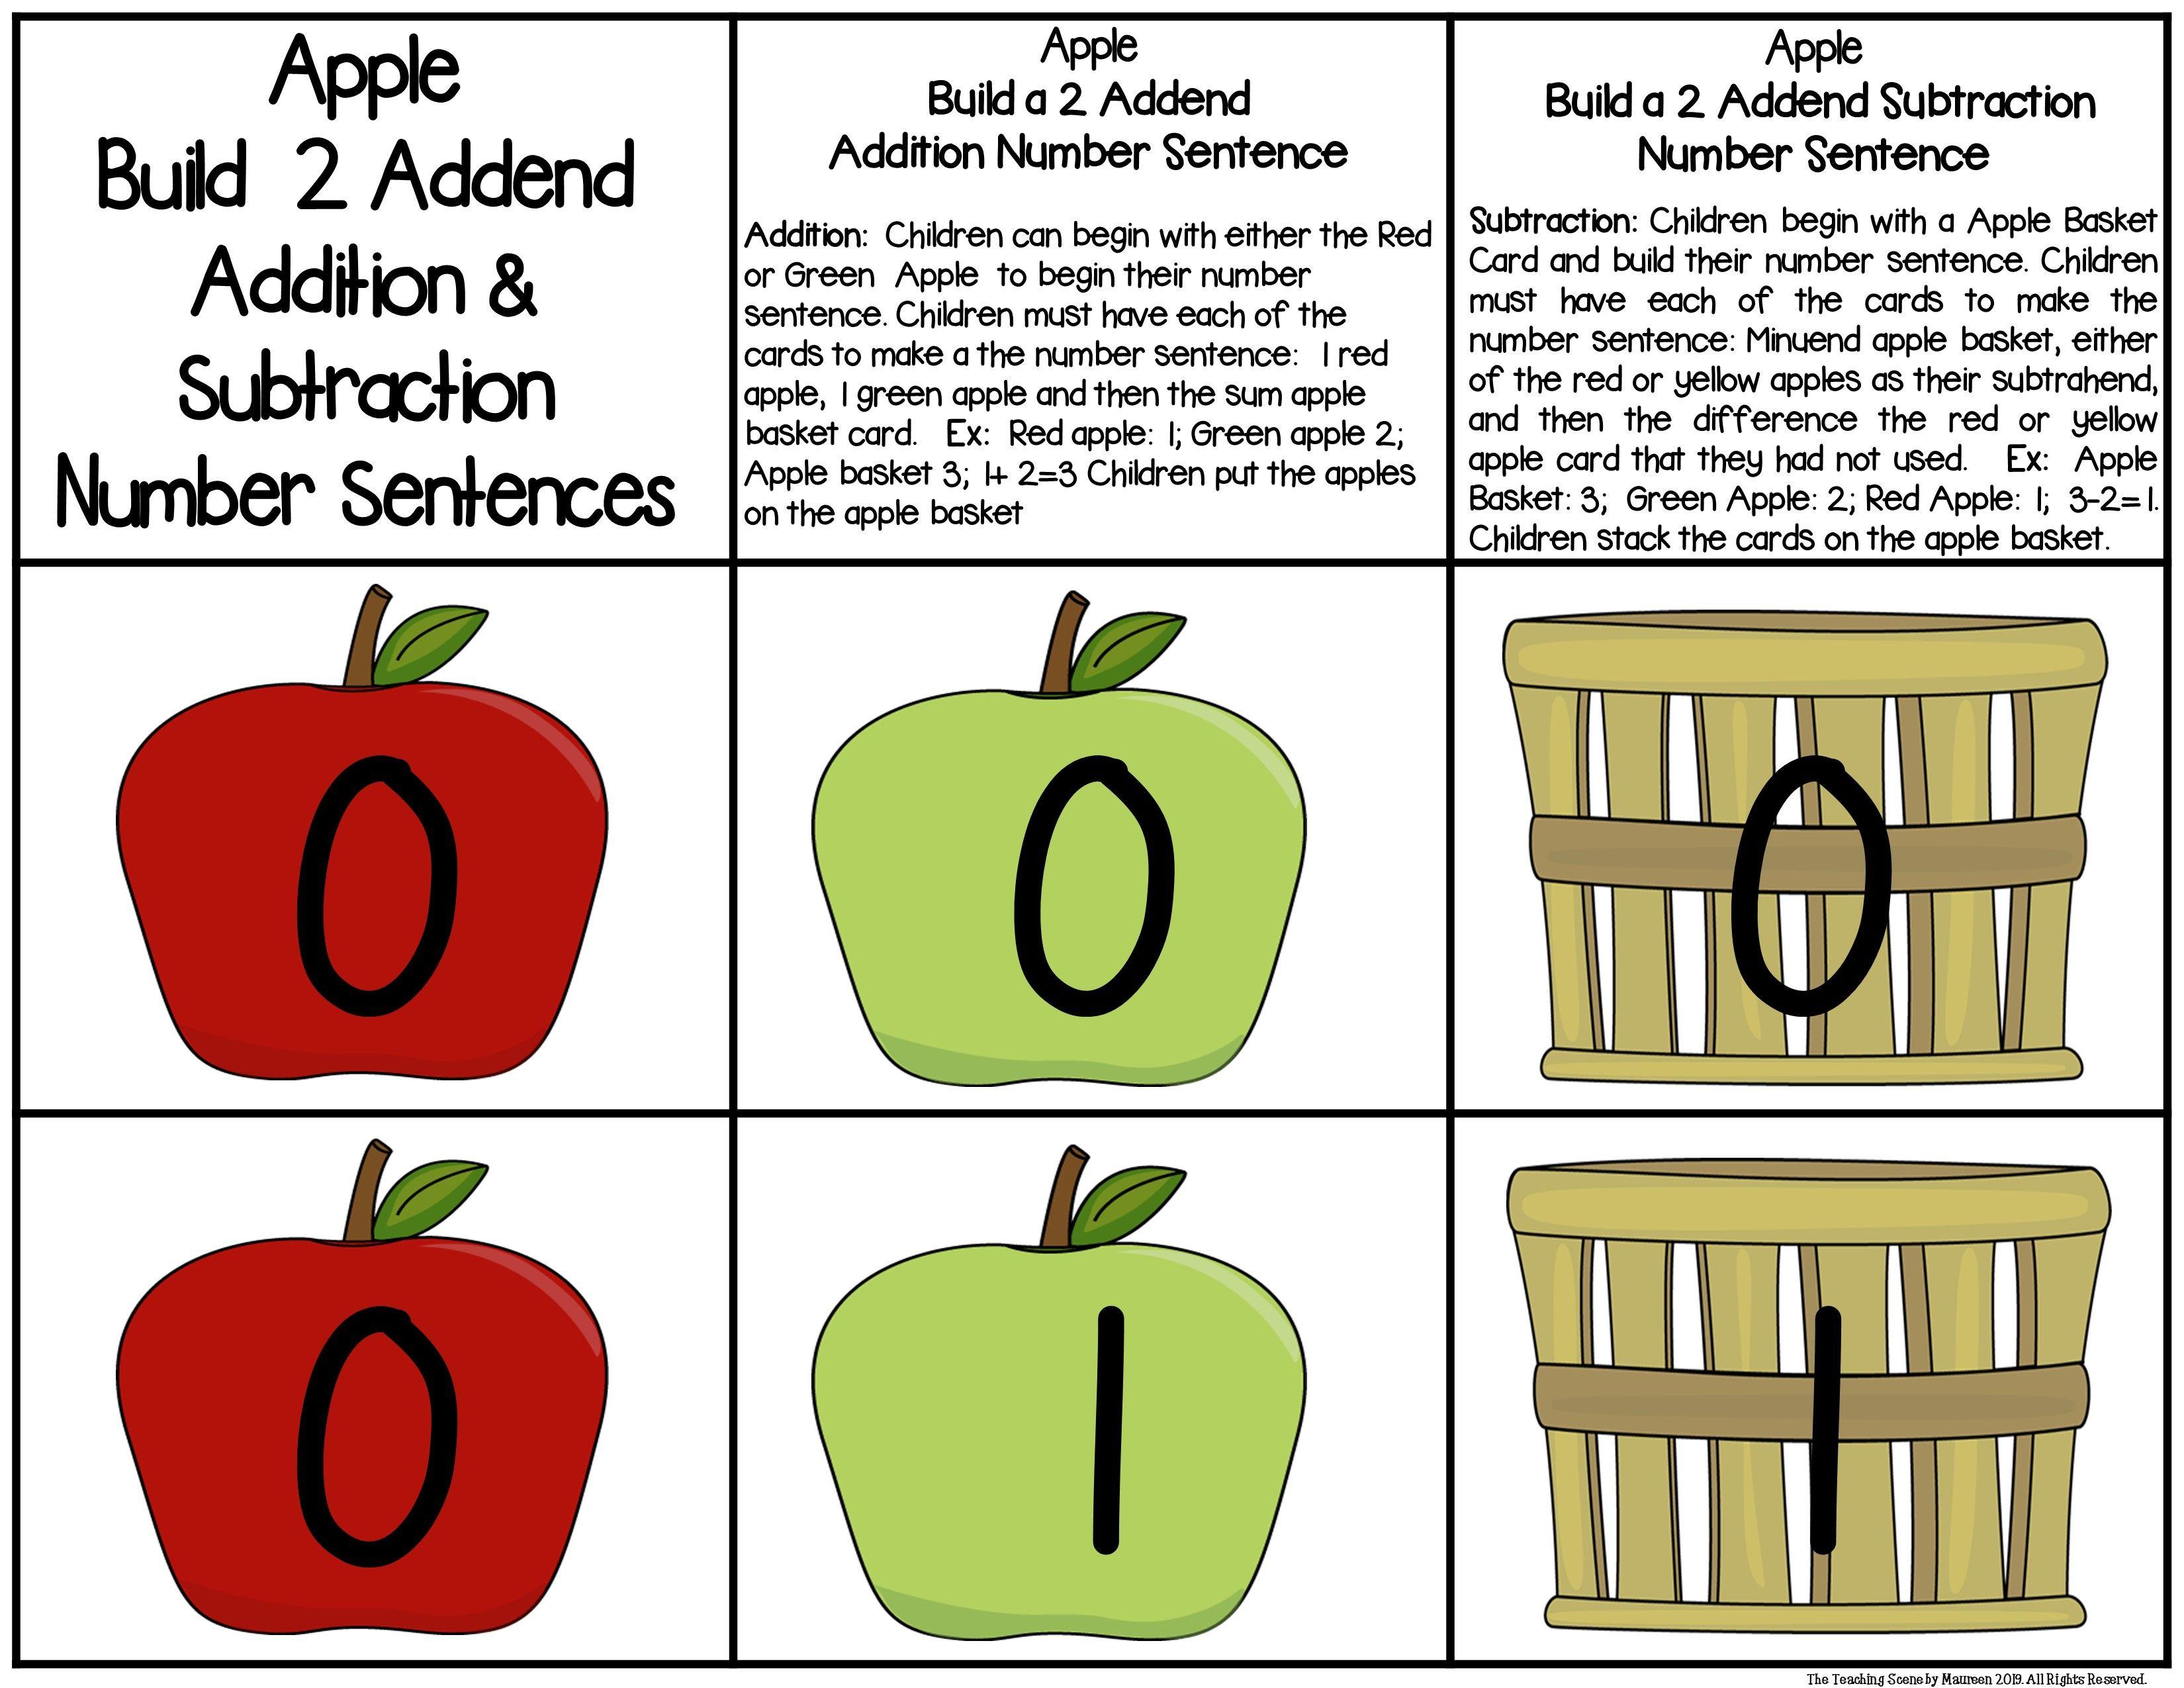 Apple Build 2 Addend 0 20 Addition Amp Subtraction Number